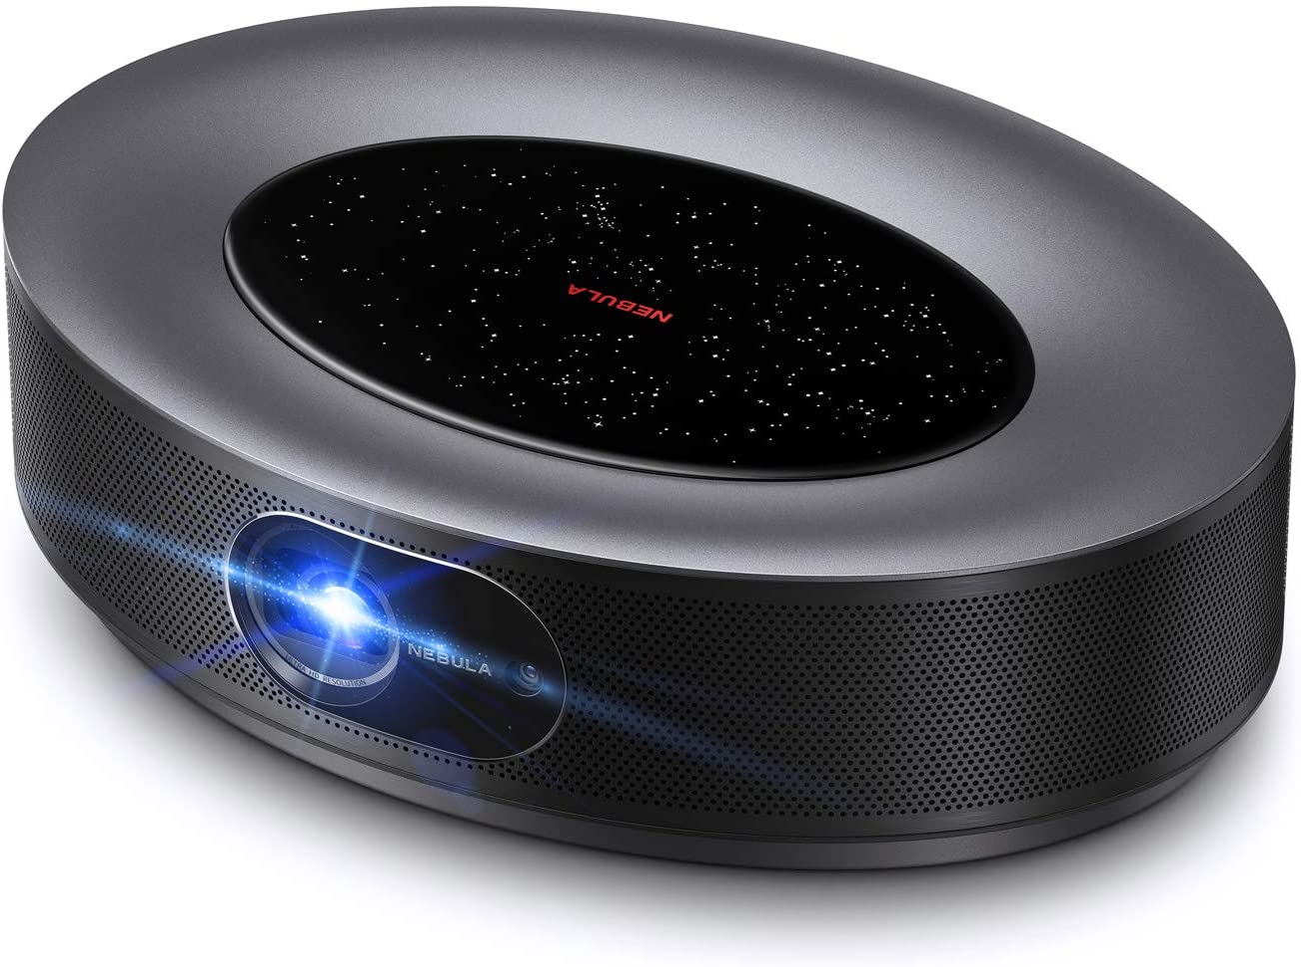 Anker Nebula Cosmos Max 4K Projector